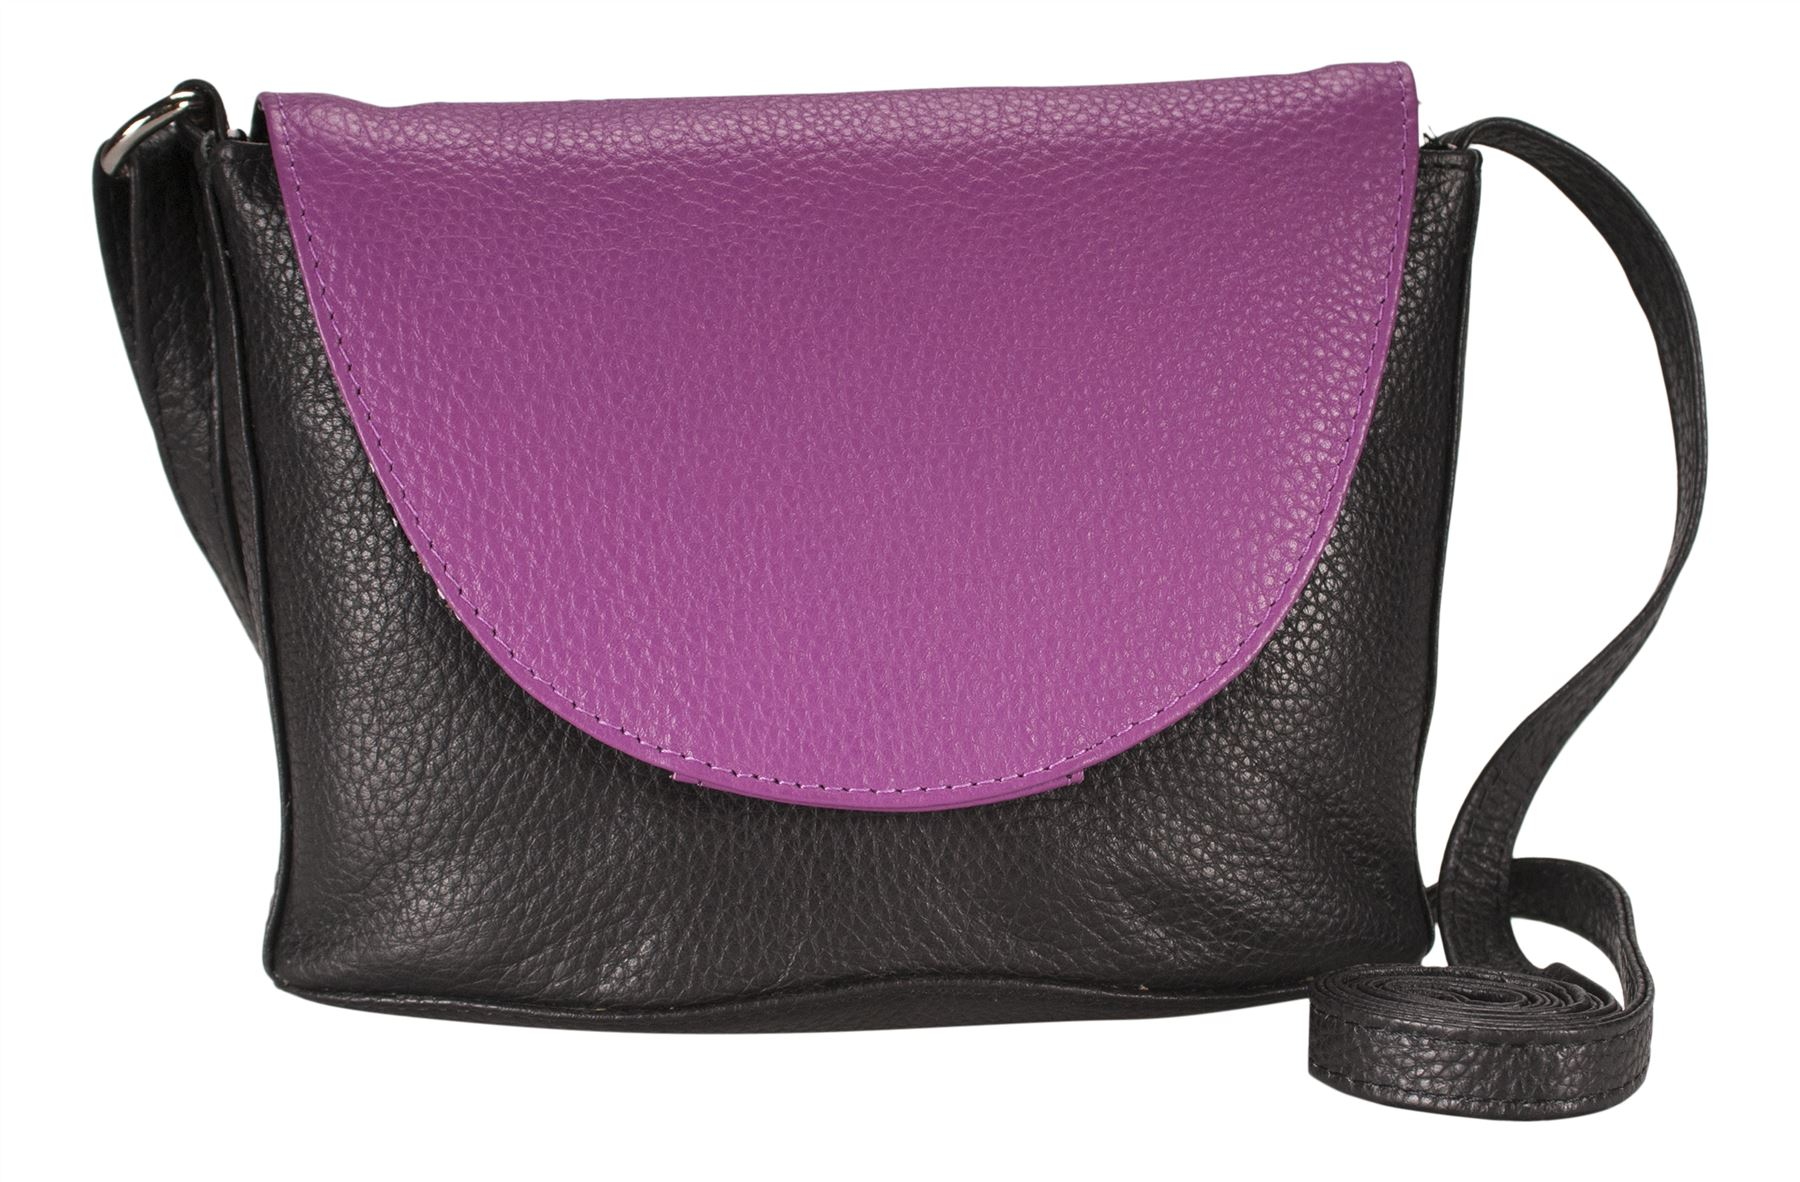 Brunhide Damen klein aus echtem Leder Tasche Womans echt Handtasche 138-300